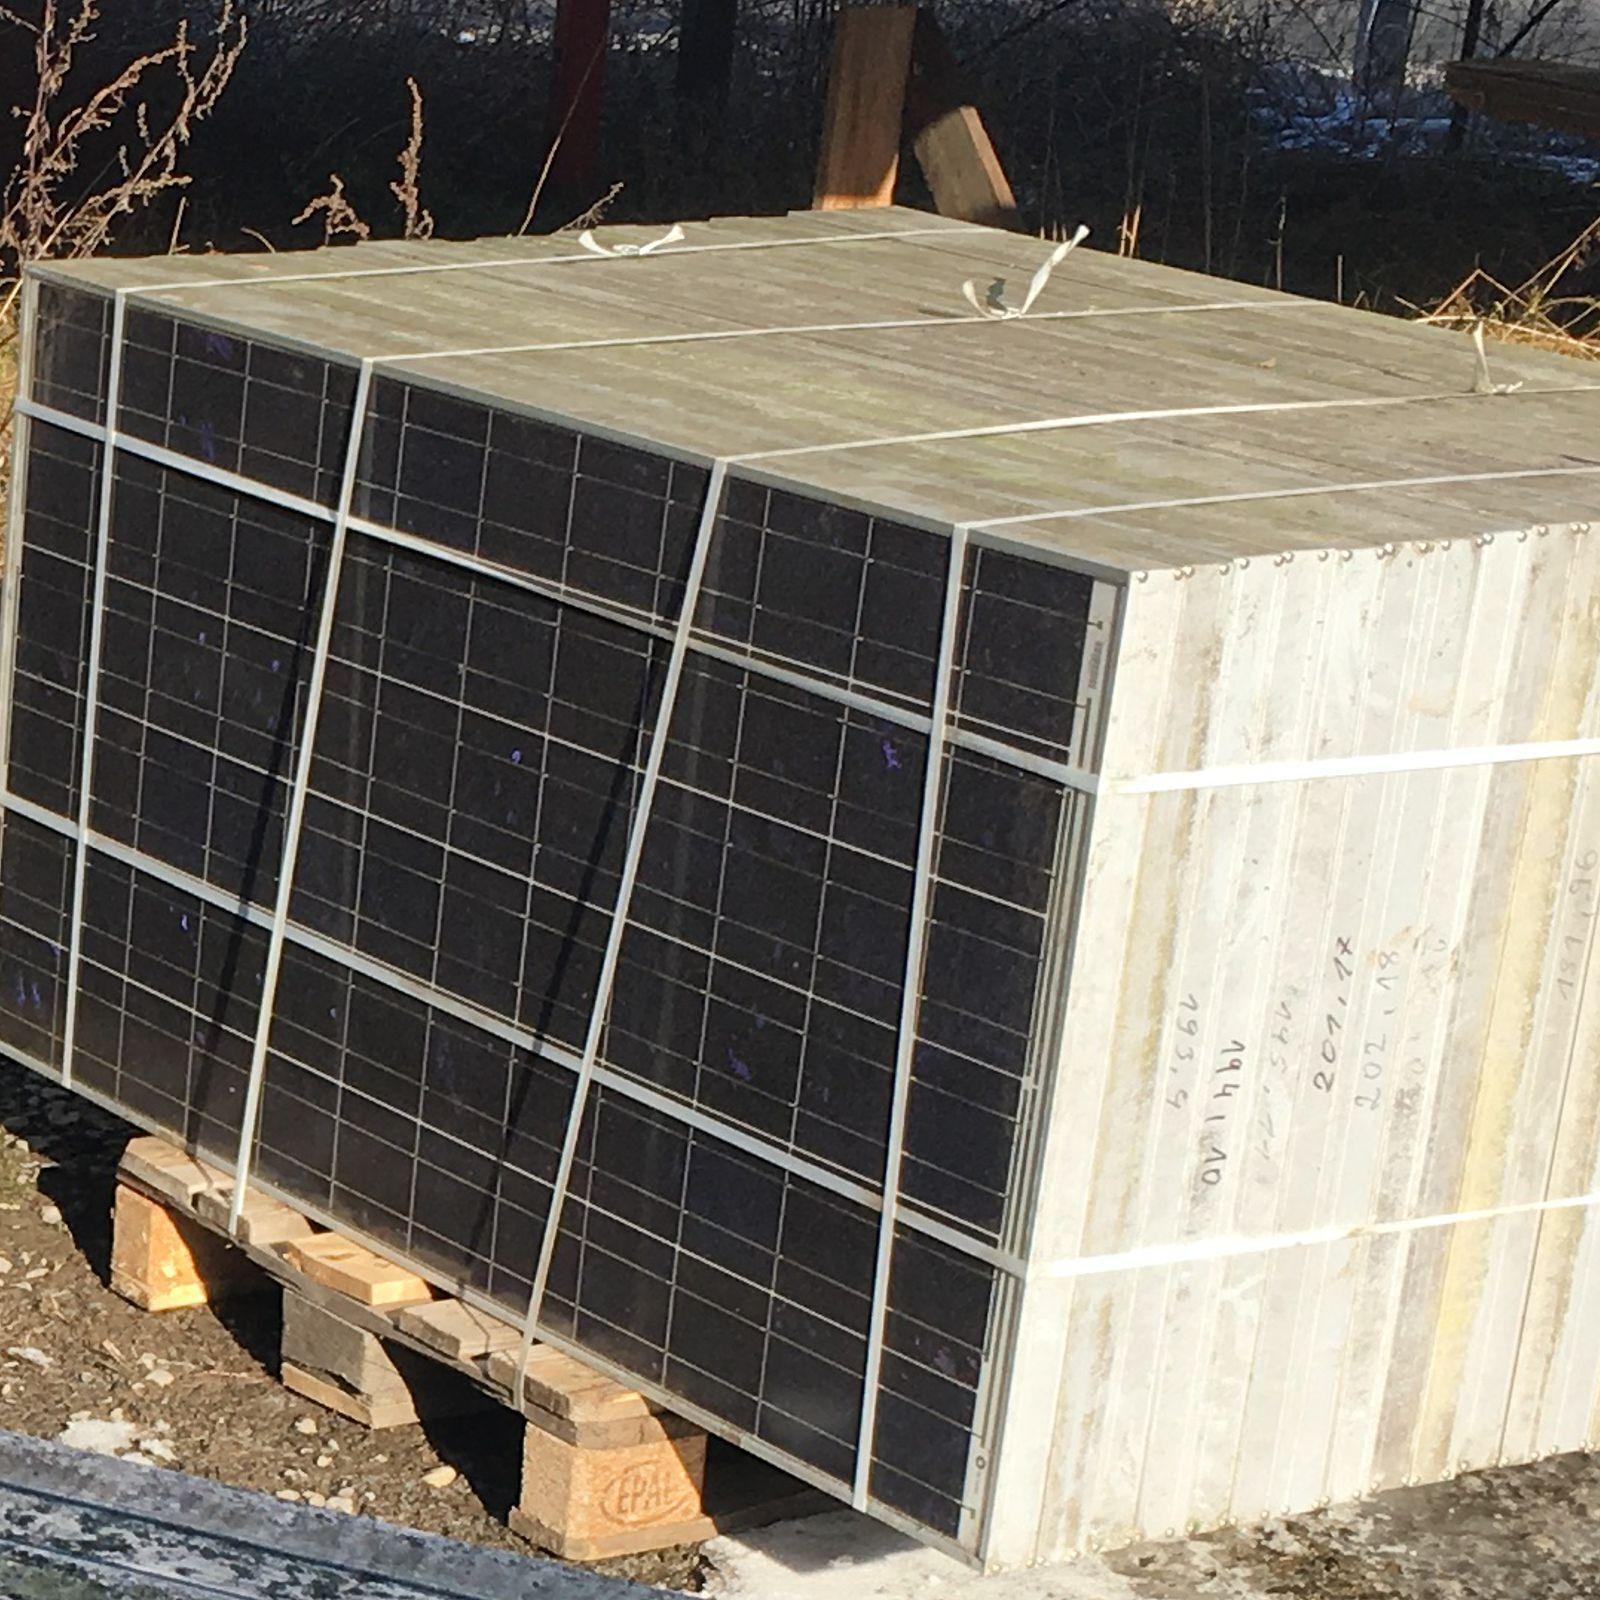 4x Z-halter Pv Modul Eloxiert Befestigung Einzel Rahmenverschraubung Solar Befestigungsmittel